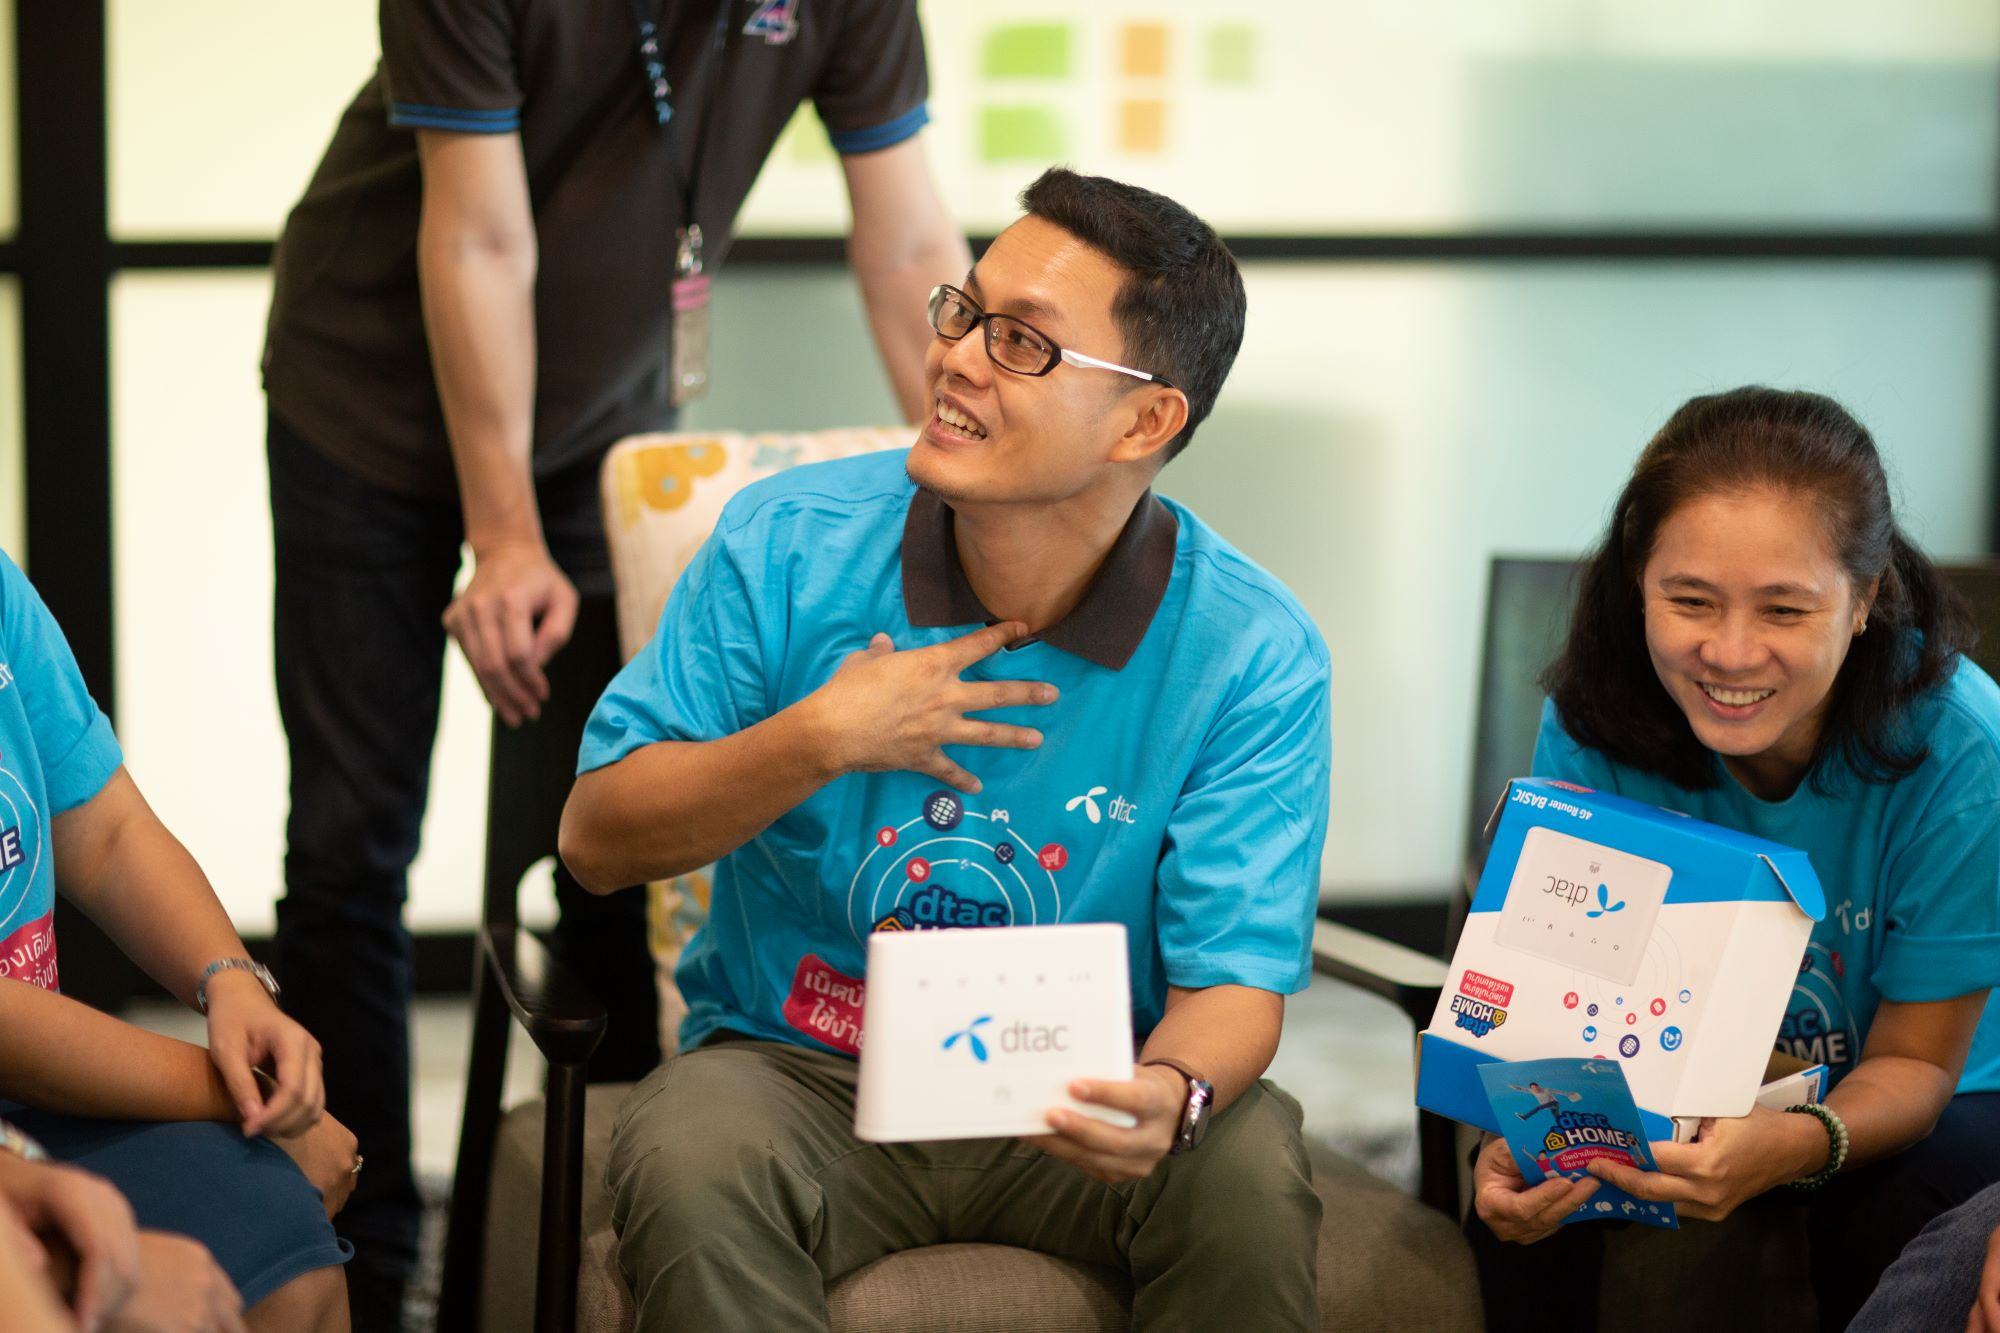 dtac@home บริการใหม่ที่จะช่วยลดความเหลื่อมล้ำทางดิจิทัลในประเทศไทย